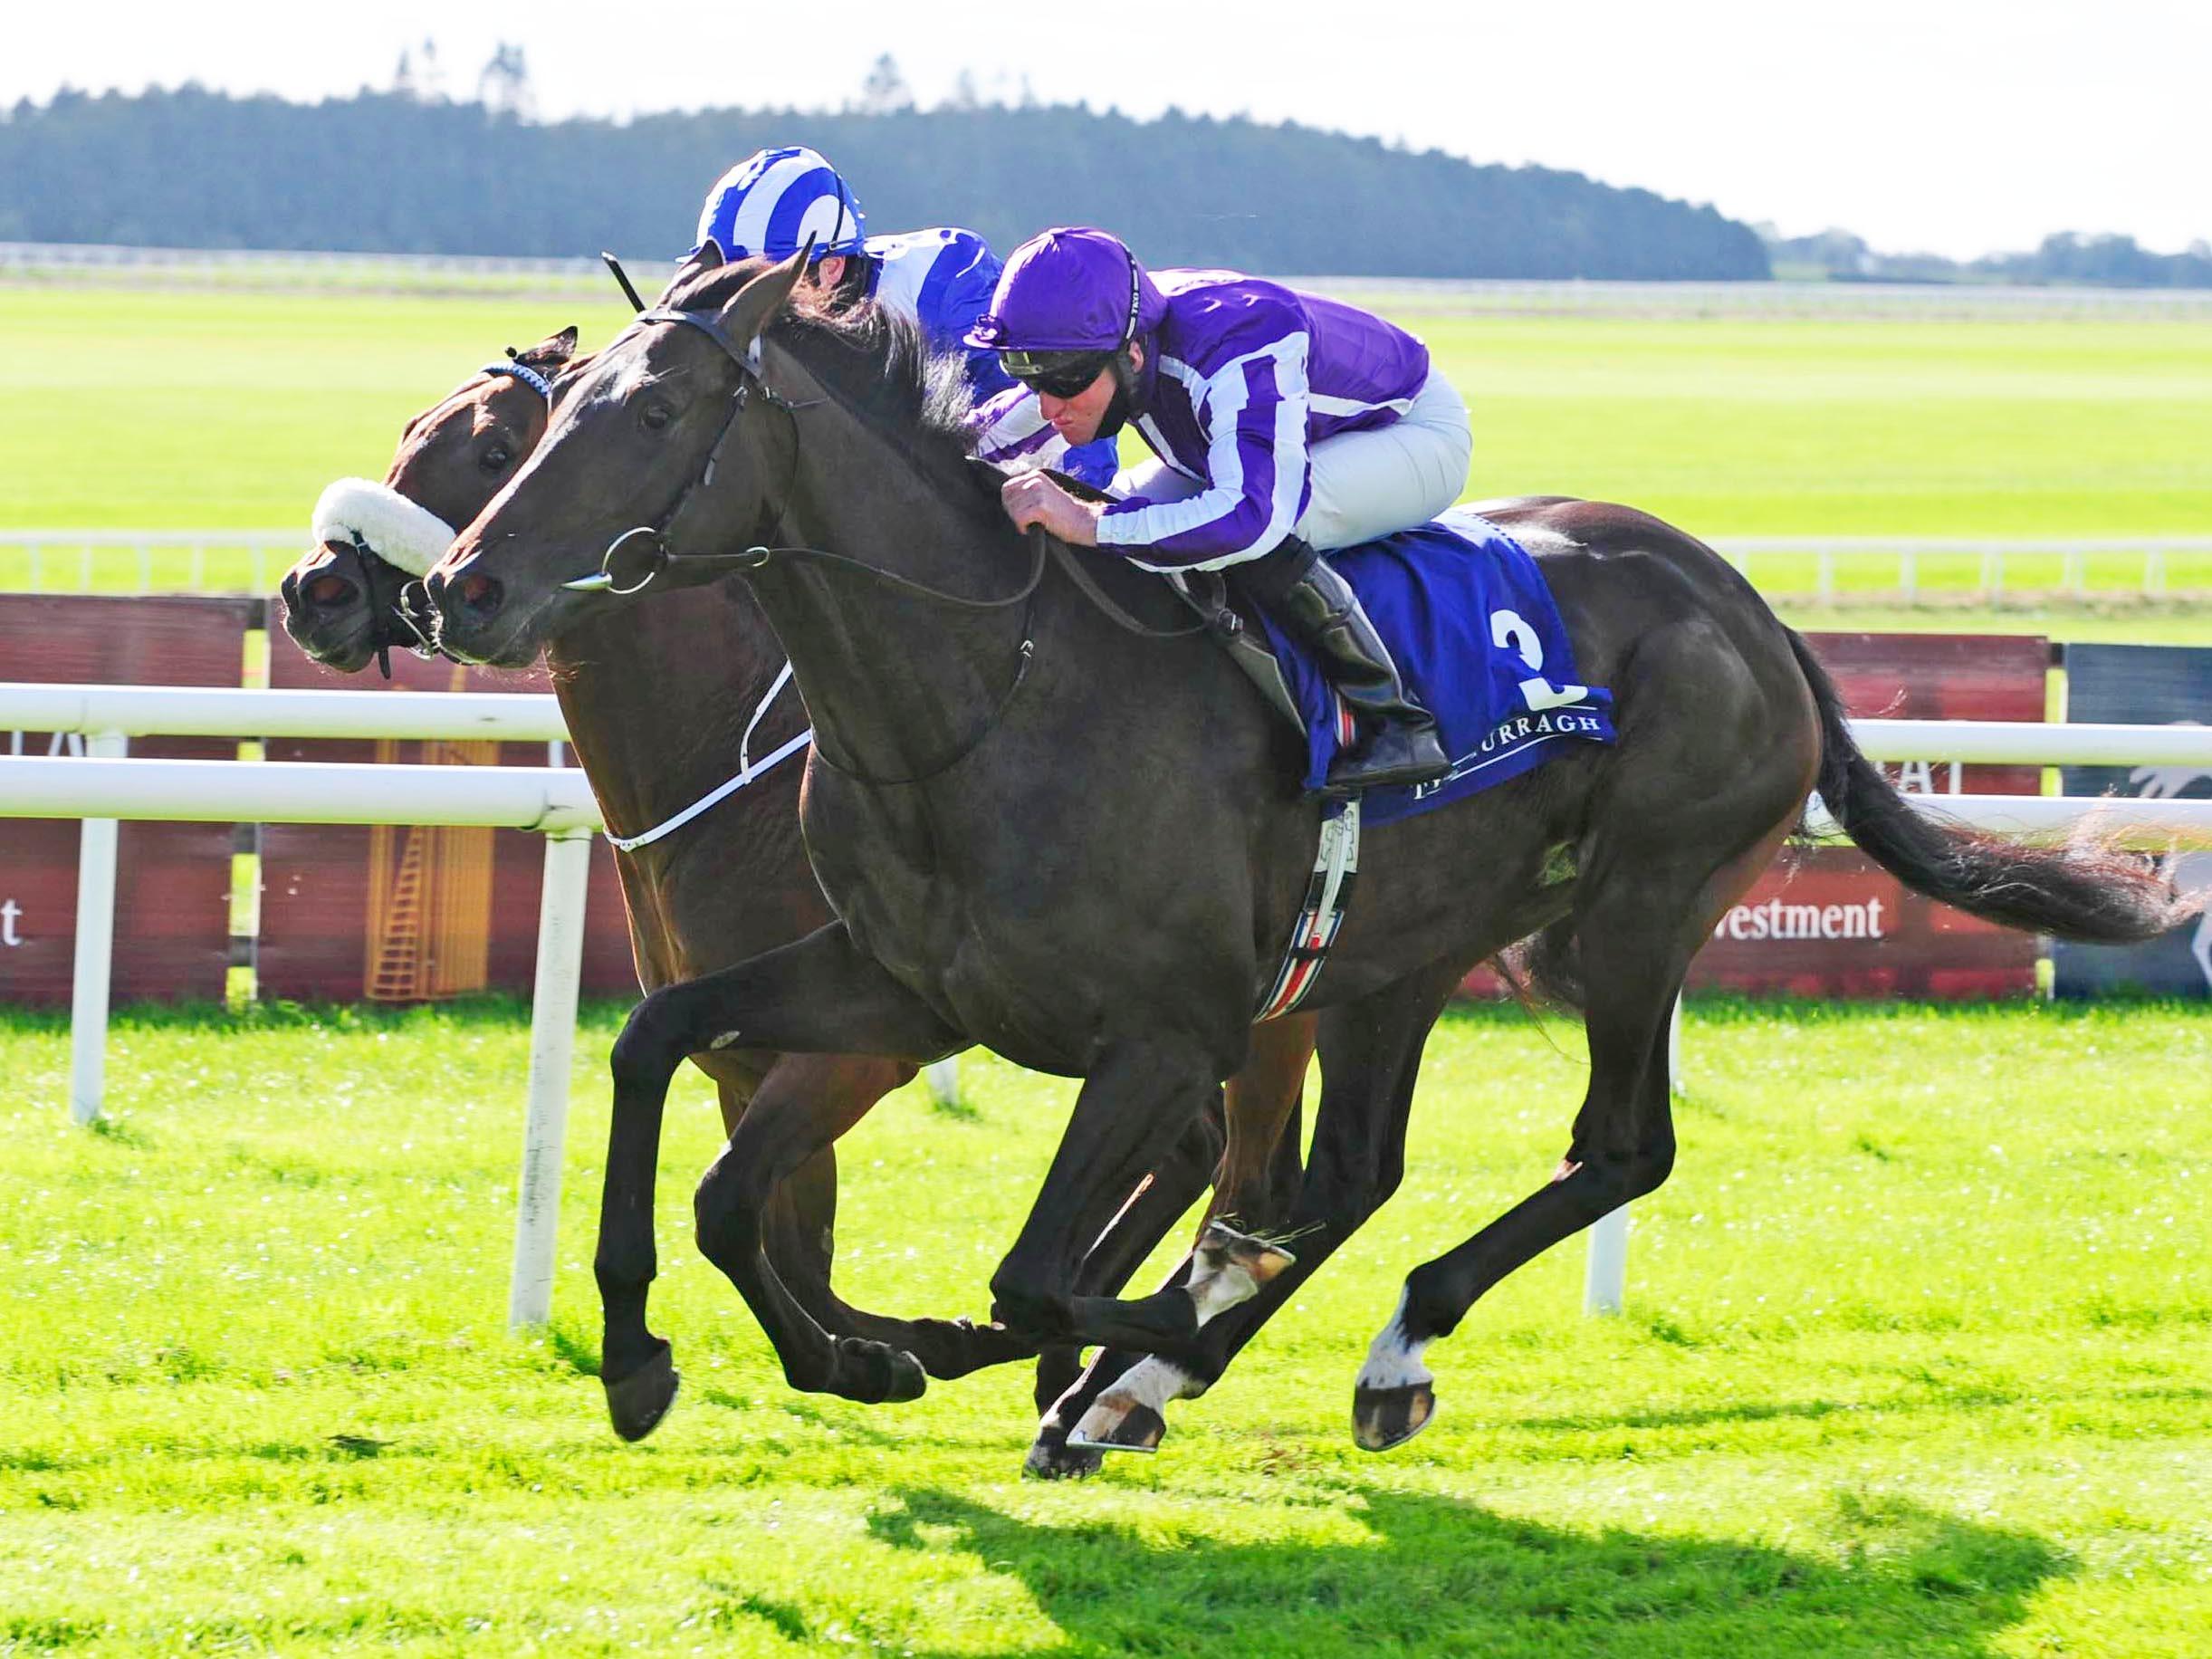 Betting odds epsom derby 2021 hyundai uk betting site offers4u